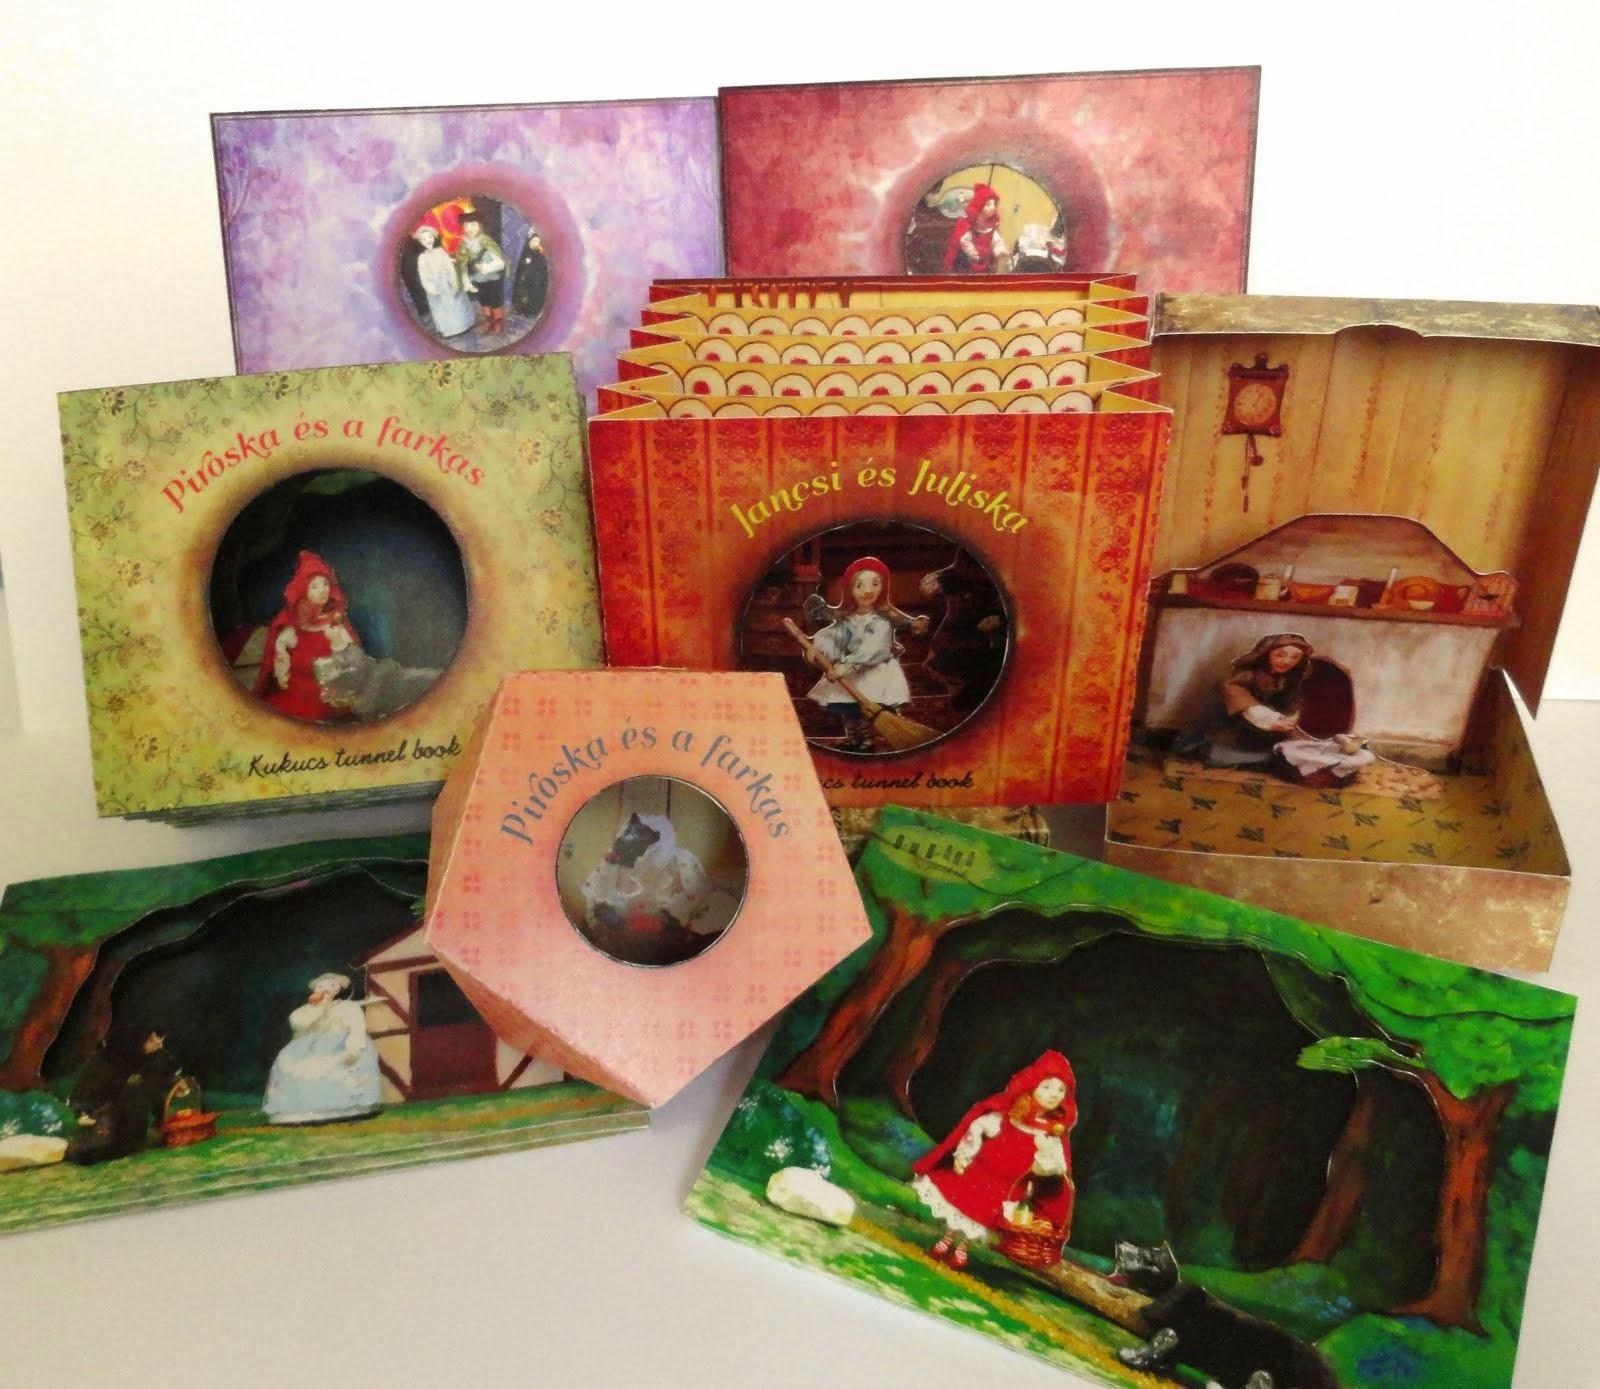 Kukucs sorozat / Grimm 's tales set